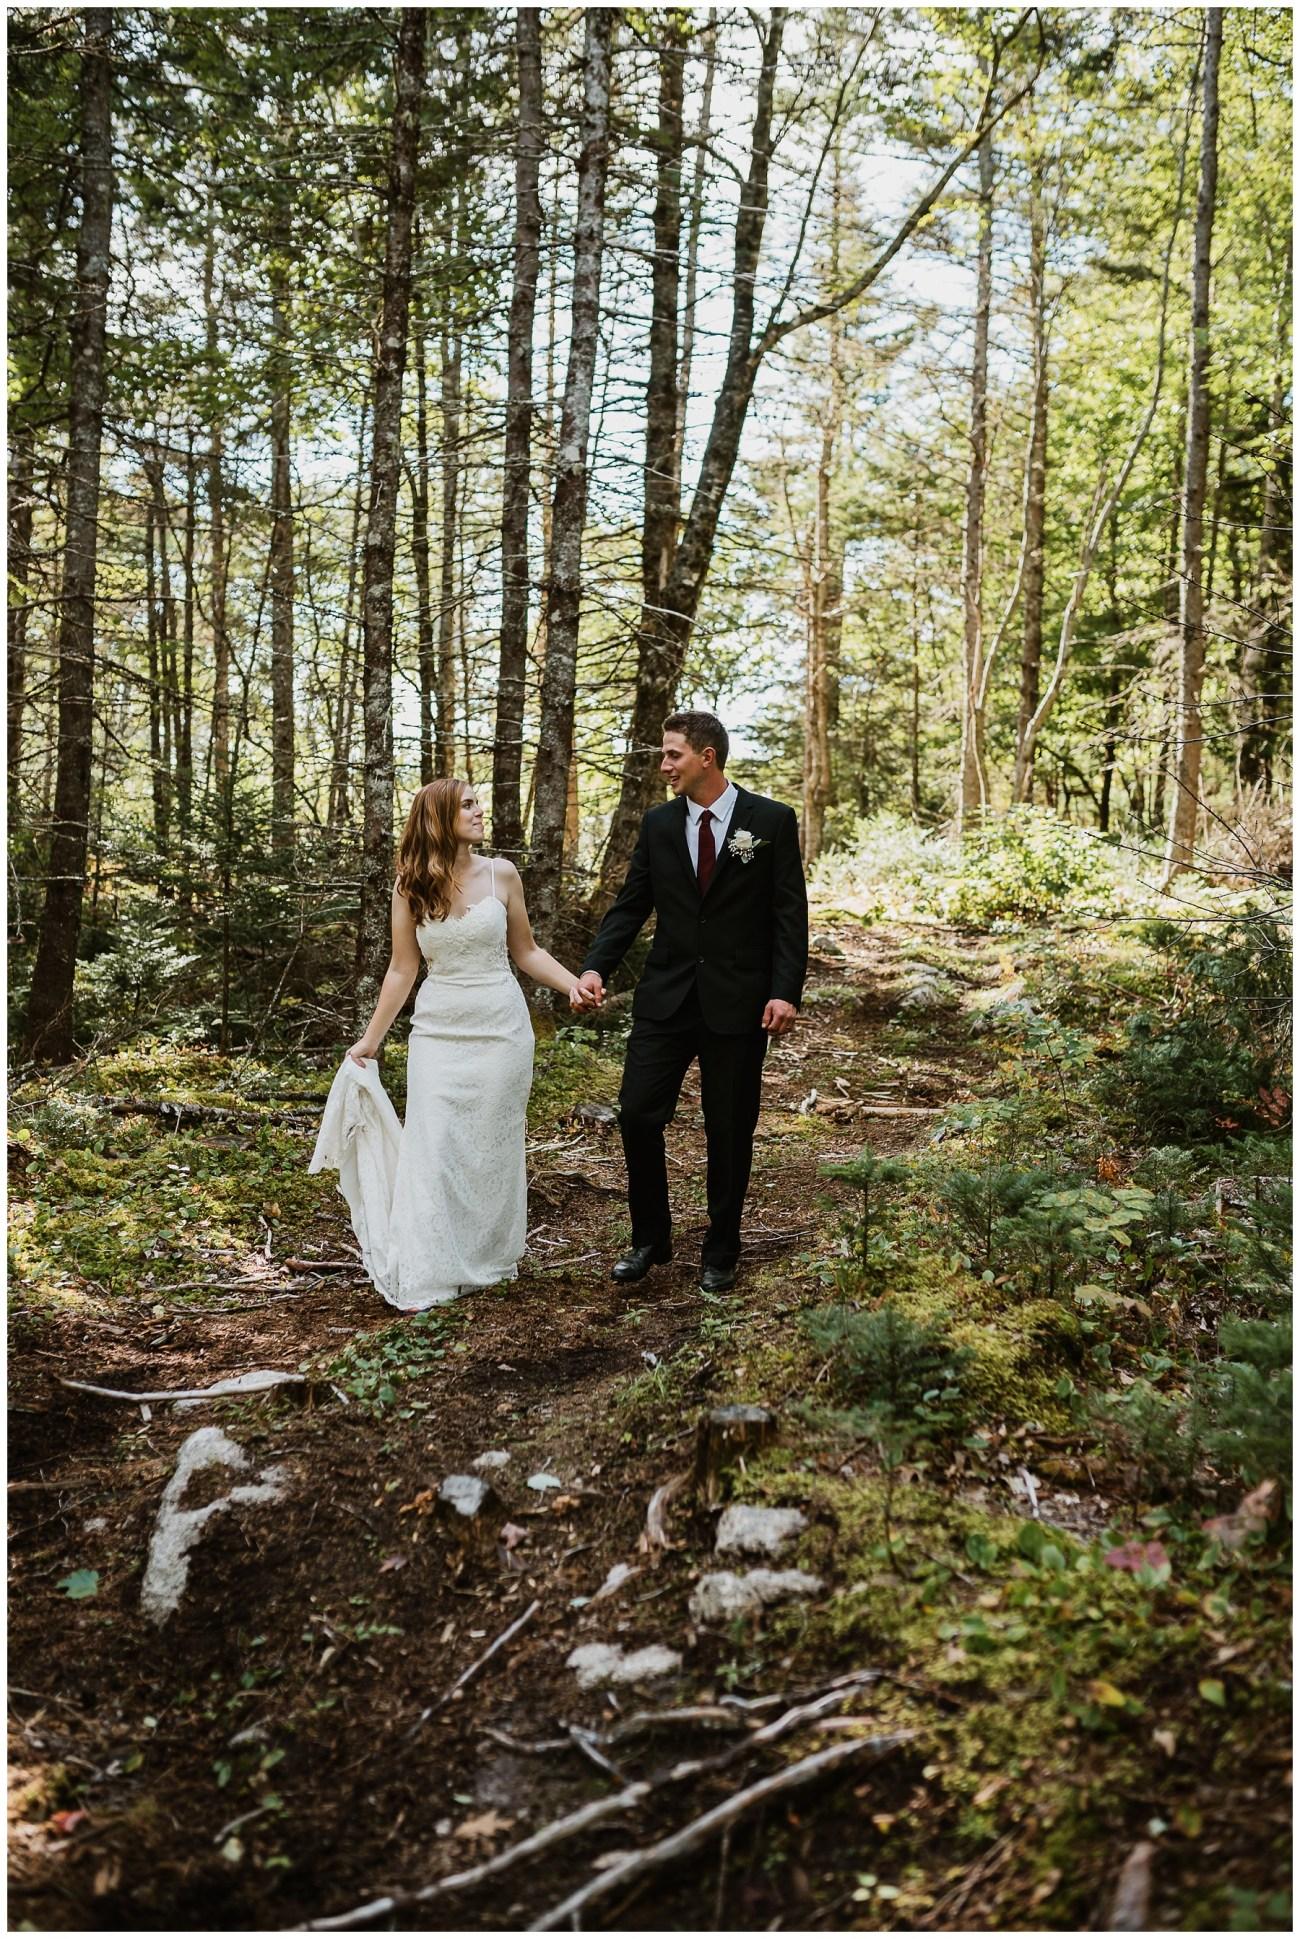 intimate-backyard-wedding-chester-nova-scotia_68.jpg